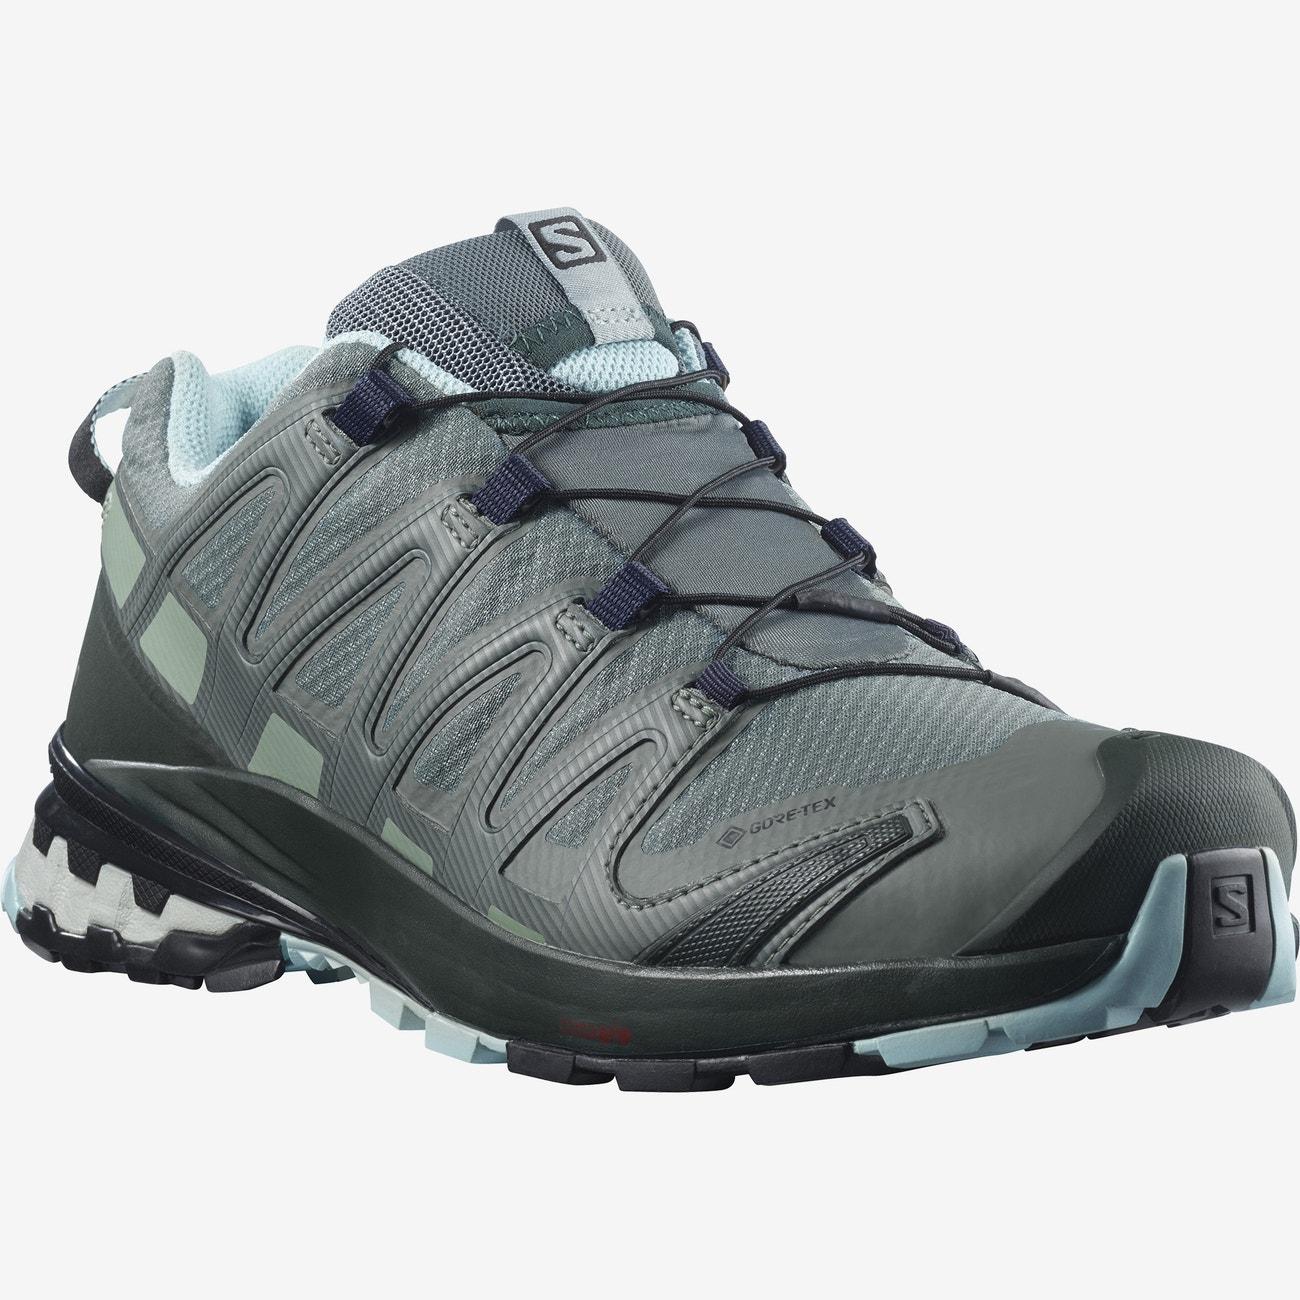 scarpa donna SALOMON XA PRO 3D V8 GTX